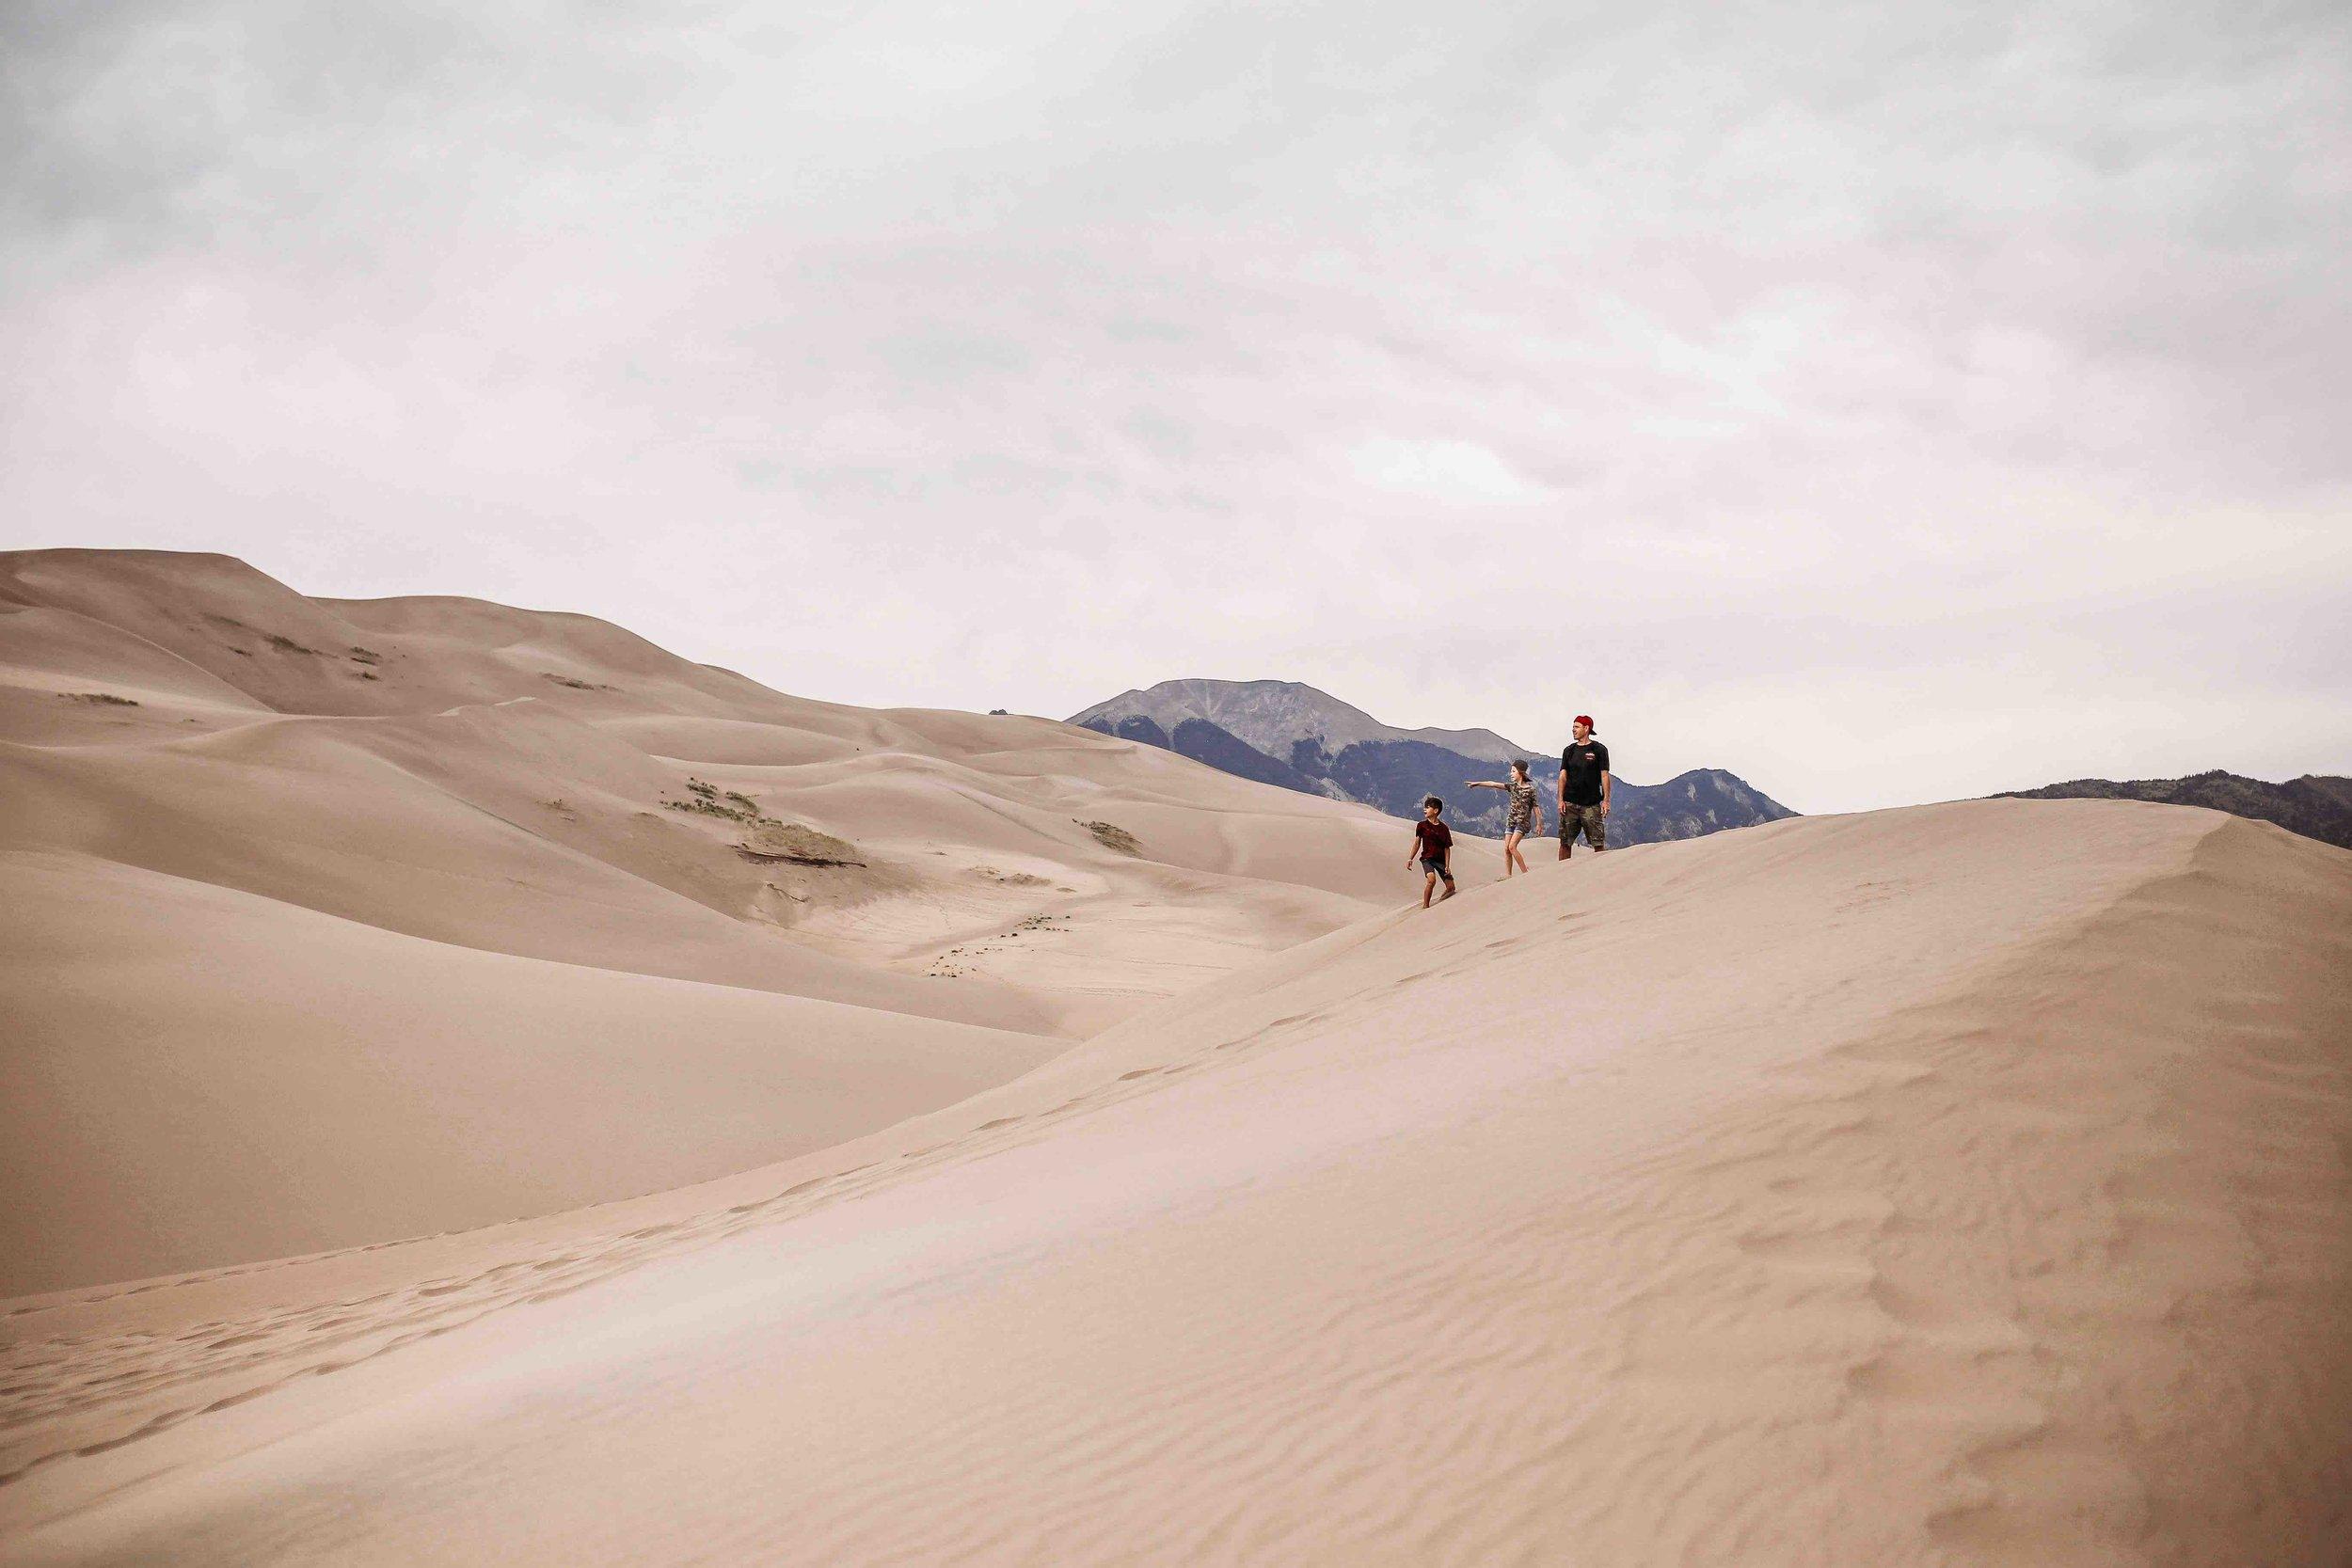 Boondocking near Great Sand Dunes National Park00004.jpeg